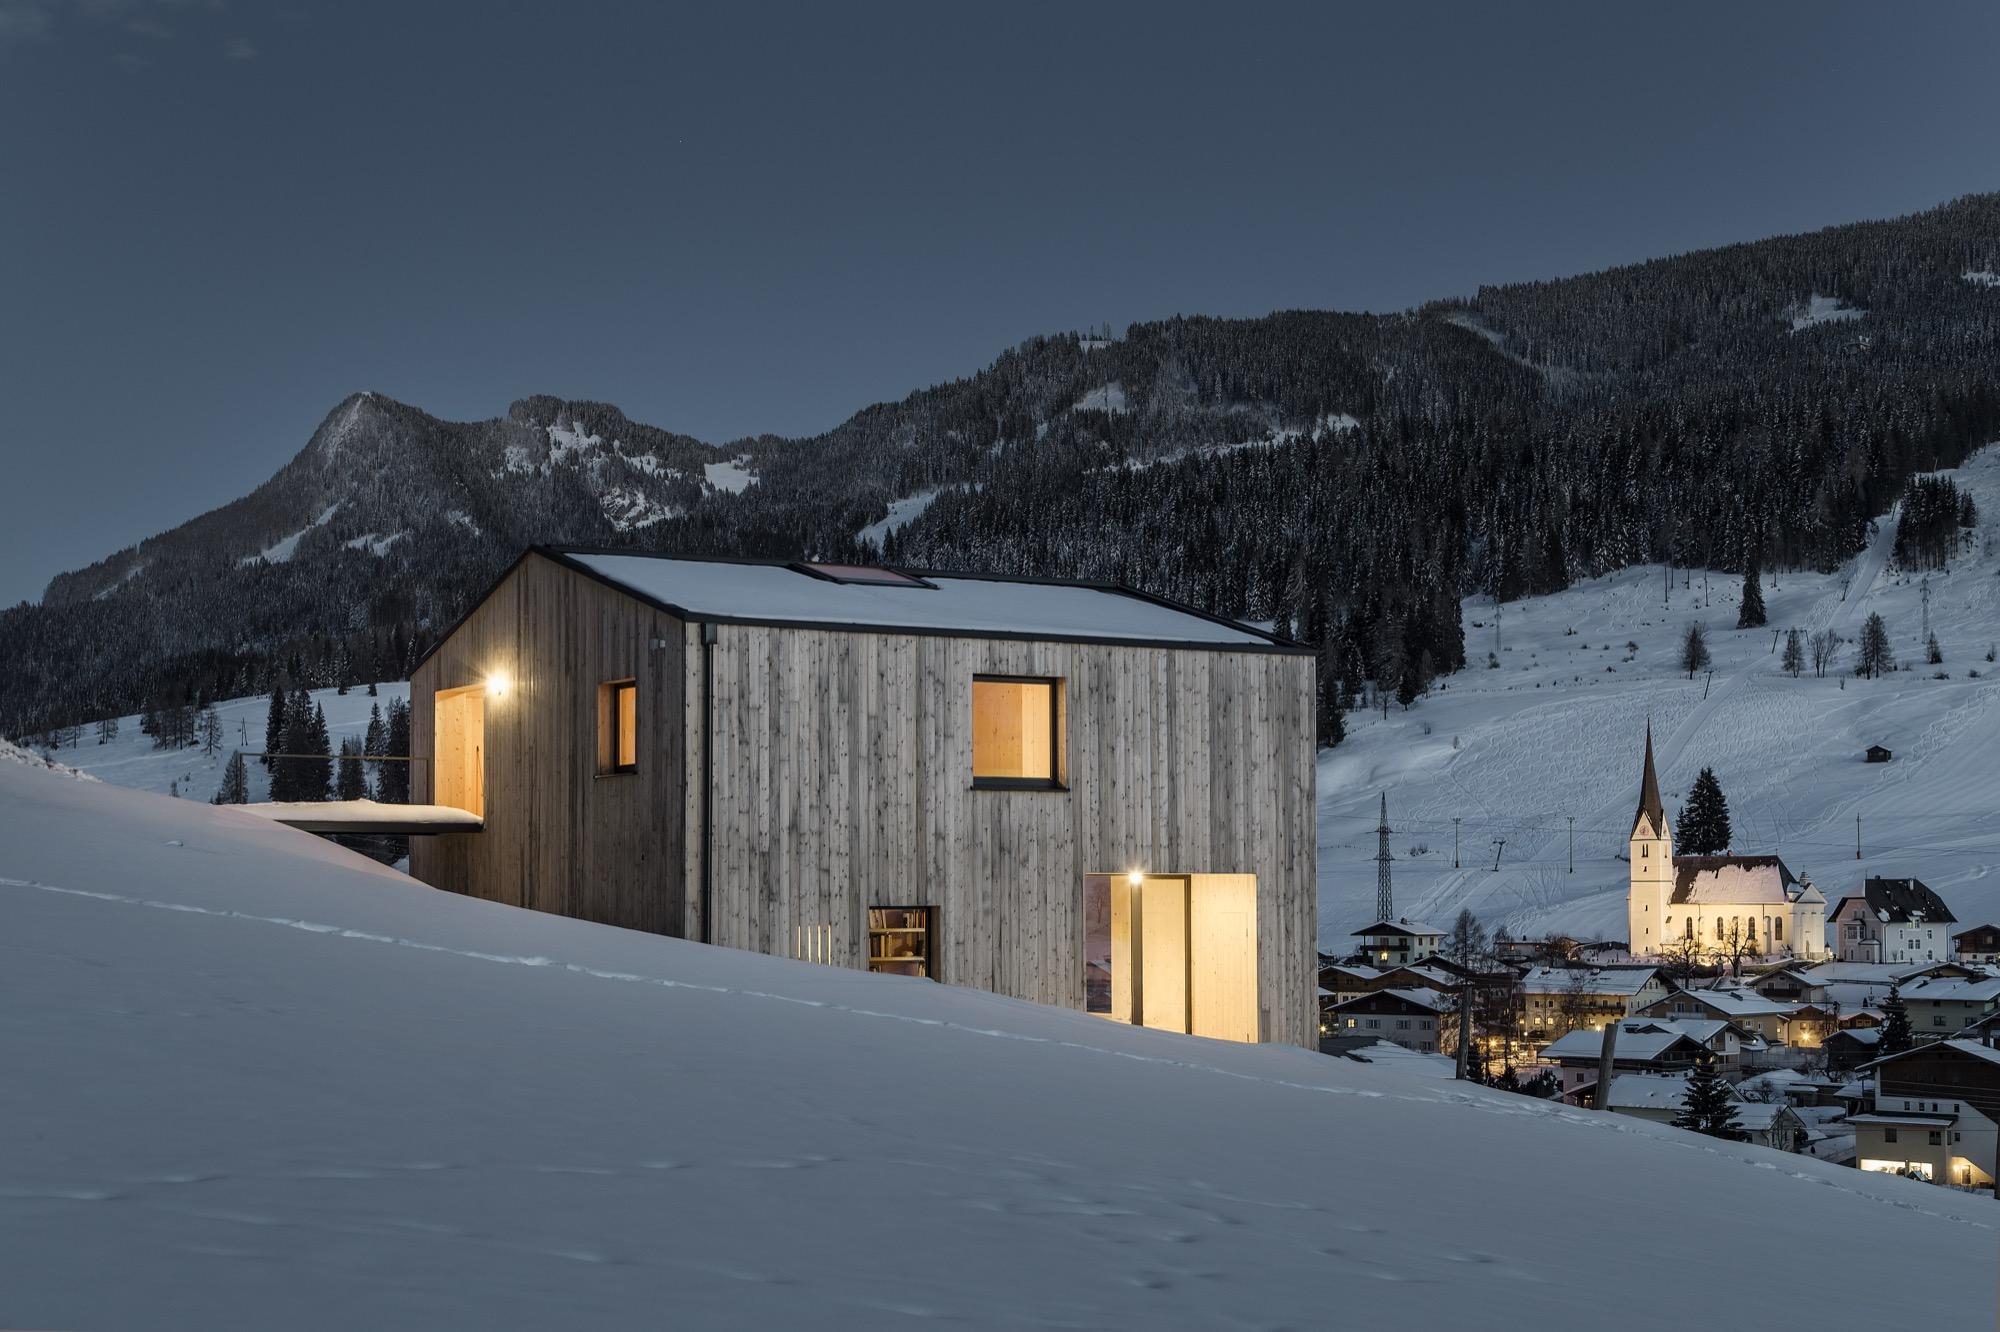 Architecture by Thomas Lechner of LP Architektur / Photo by Albrecht Imanuel Schnabel